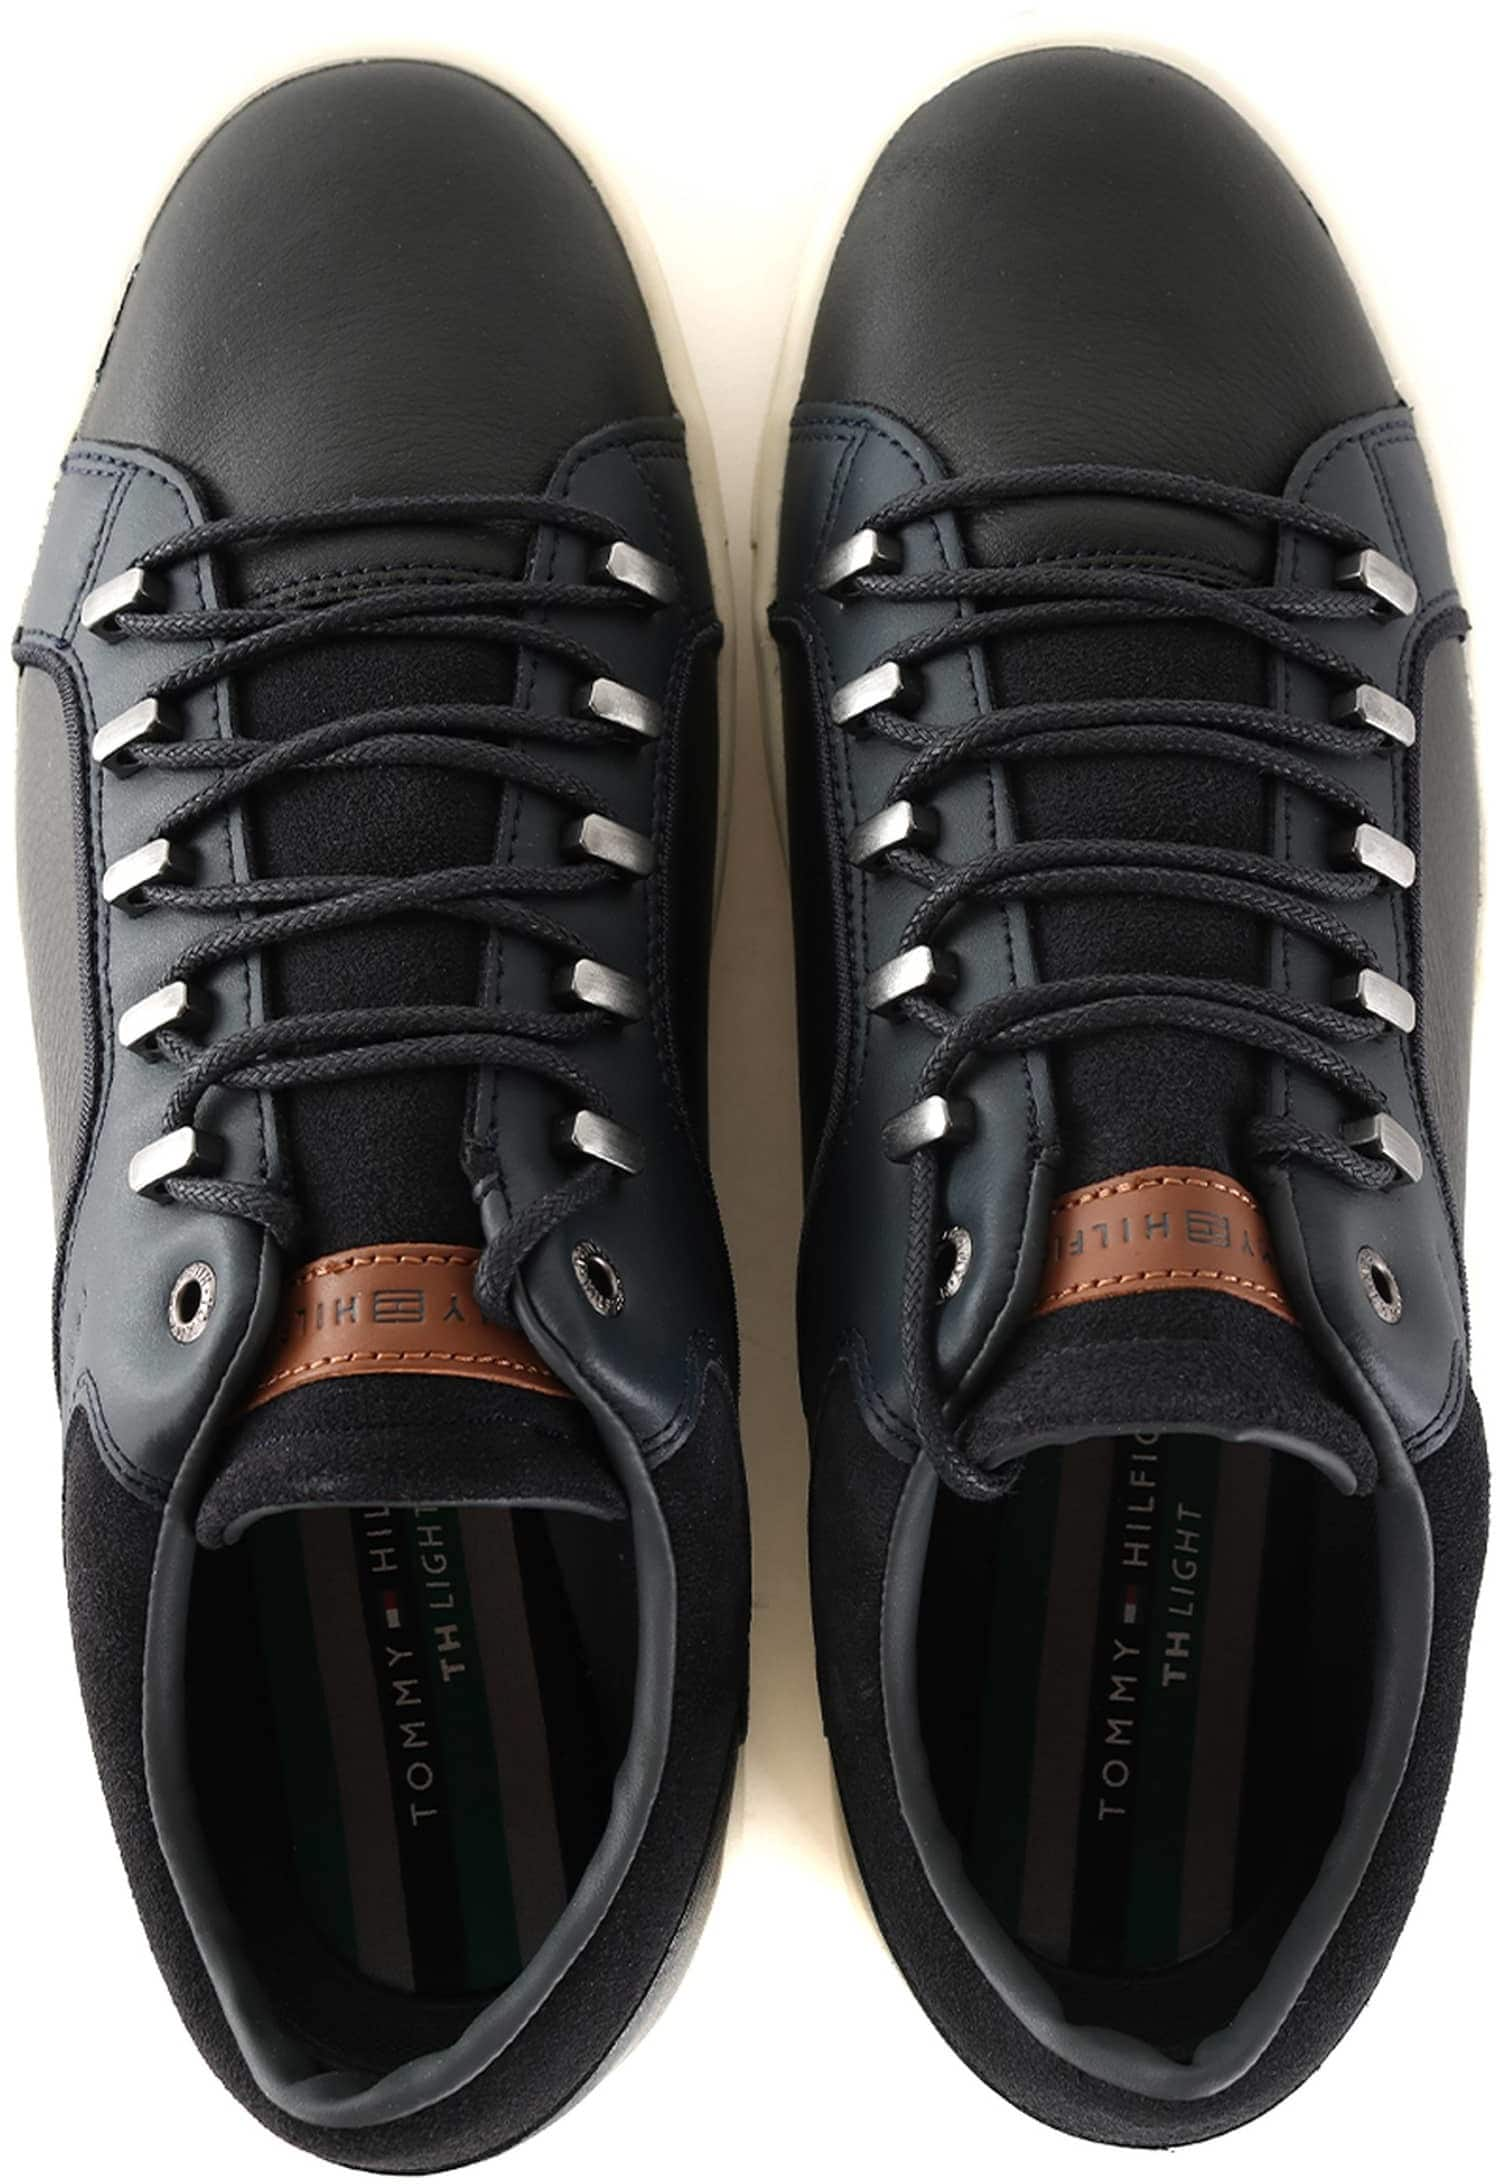 Tommy Hilfiger Sneaker Zwart + Donkerblauw foto 3